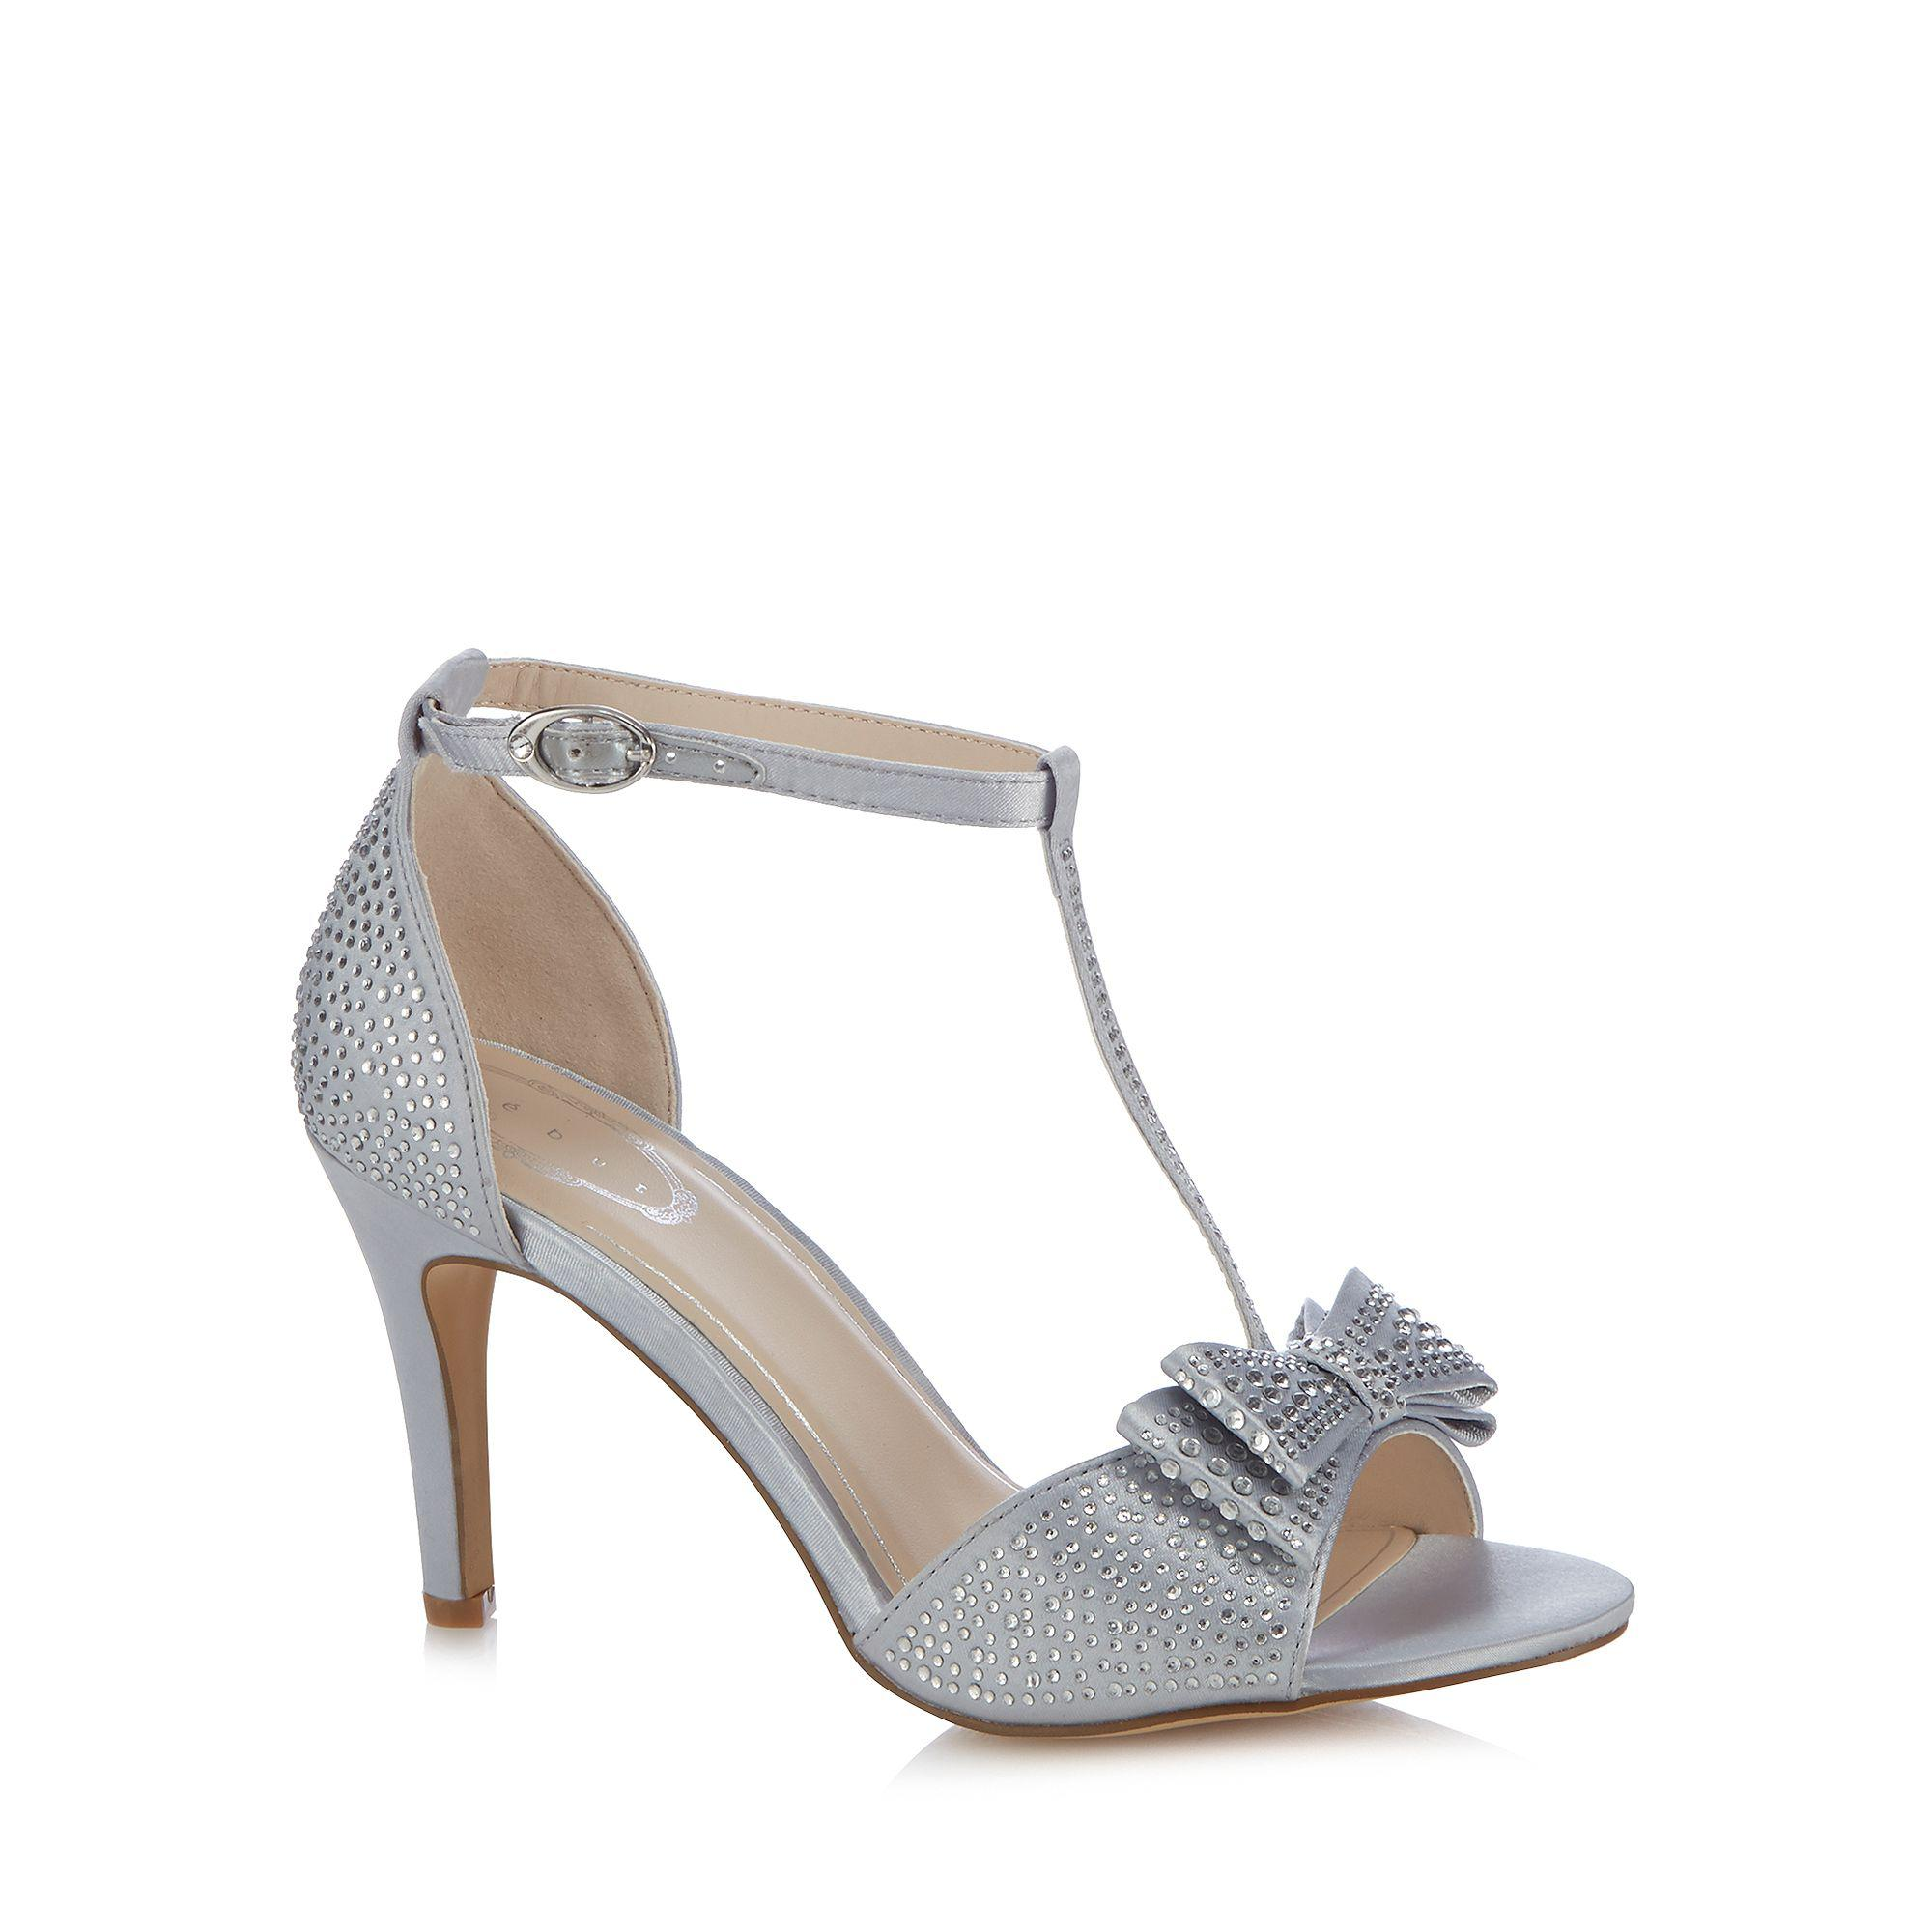 d3c6c6318b2 Début Silver 'dorothy' Diamante T-bar High Heeled Sandals in ...